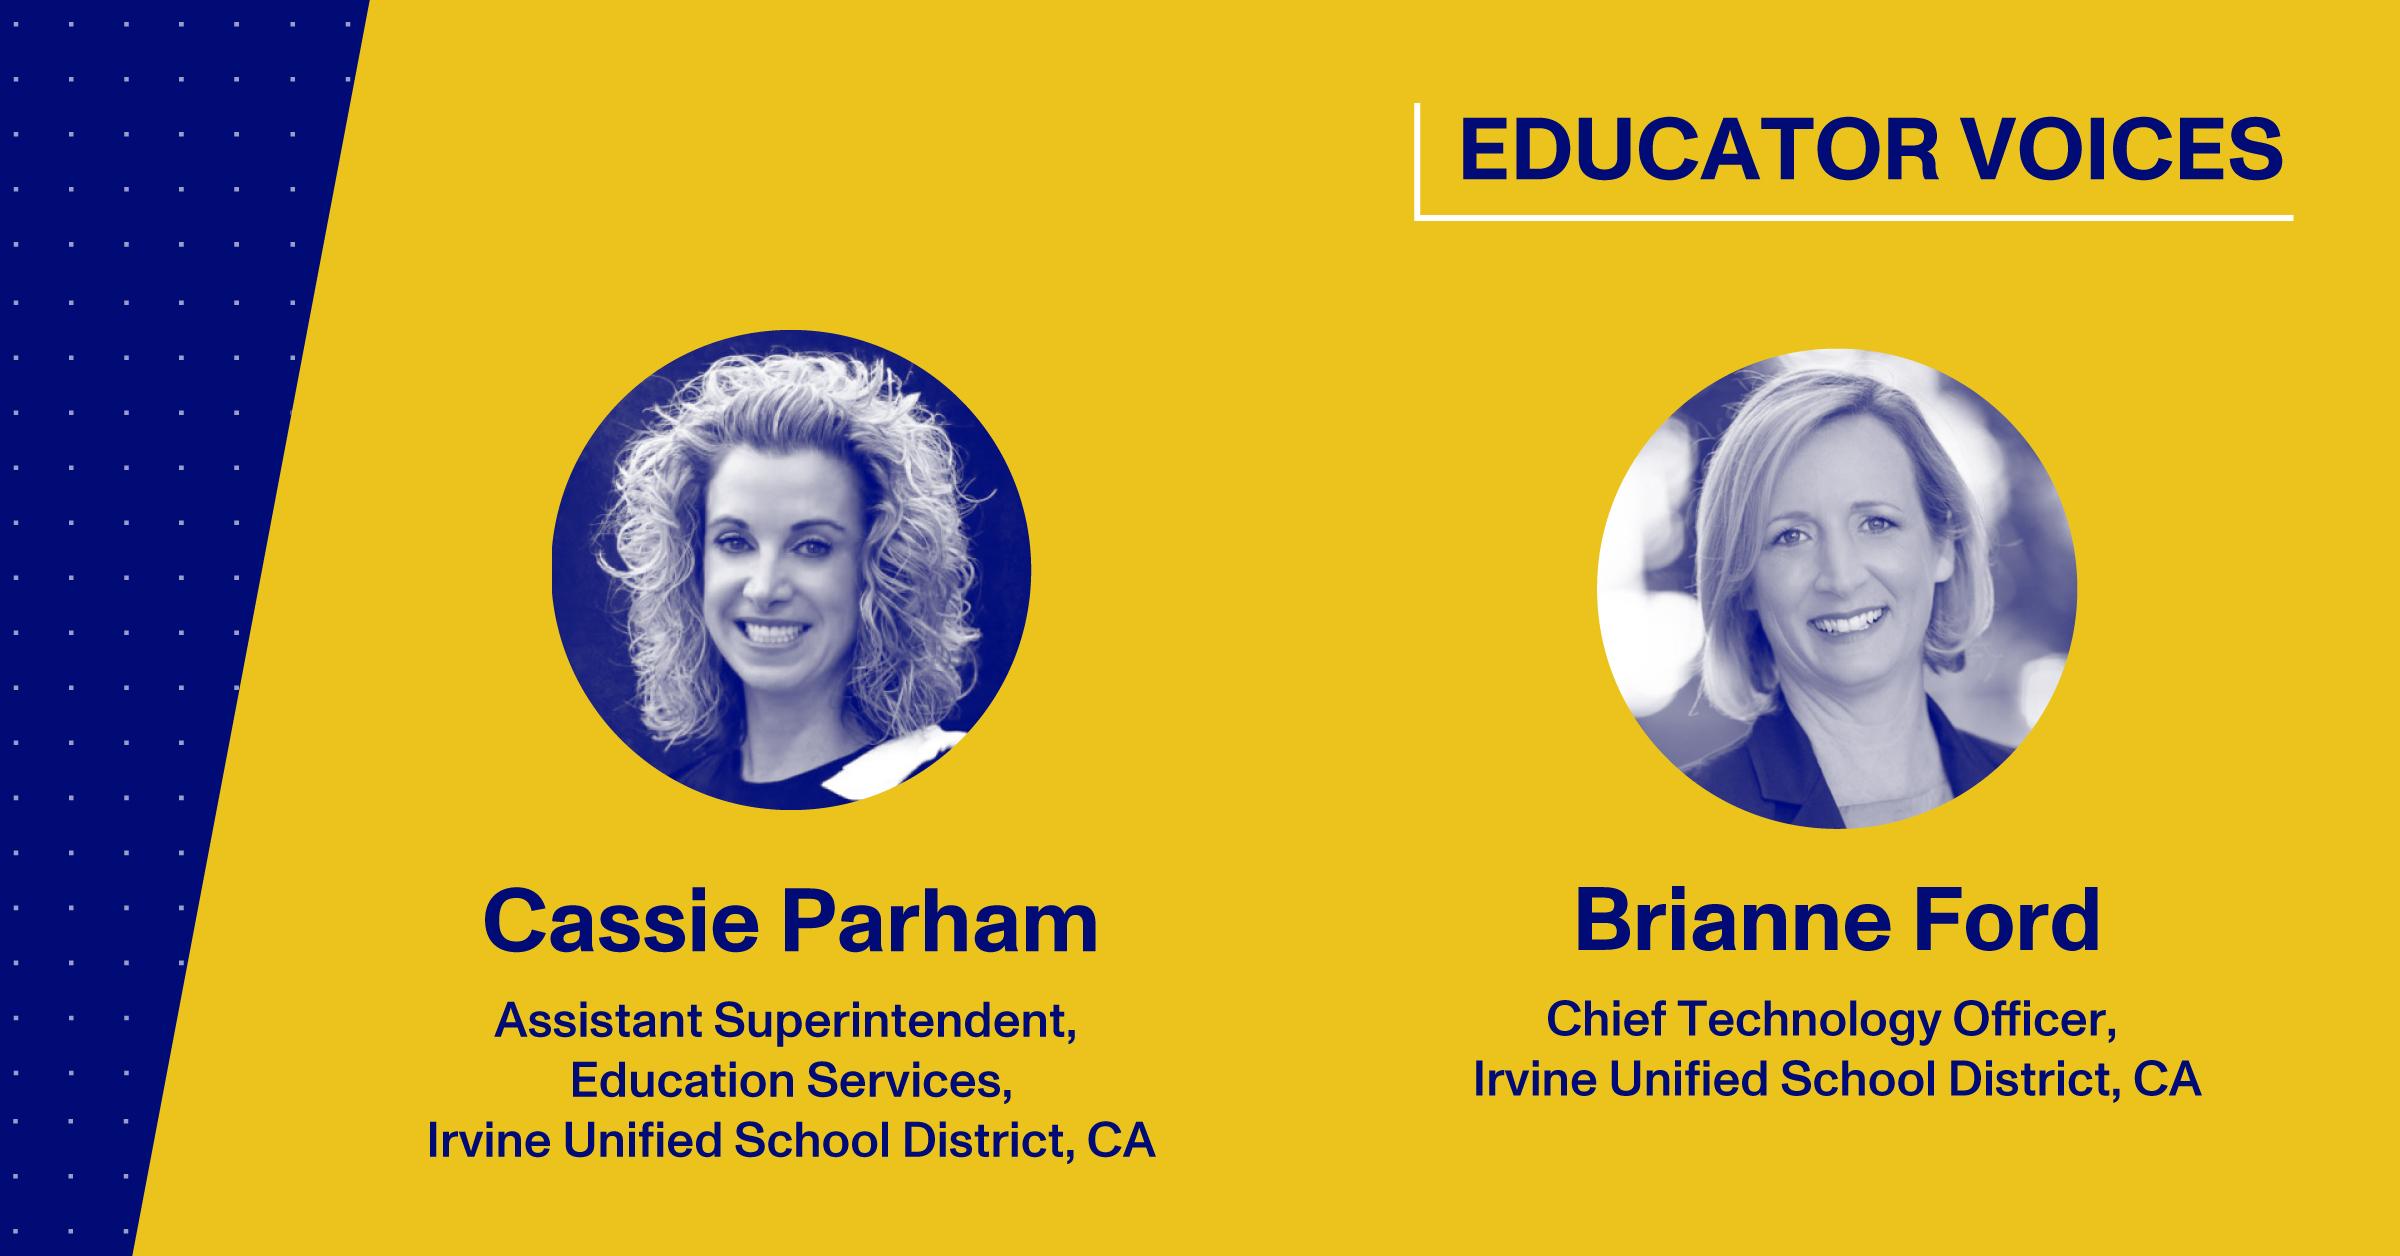 Cassie Parham, Assistant Superintendent, Irvine USD, CA; Brianne Ford, CTO, Irvine USD, CA